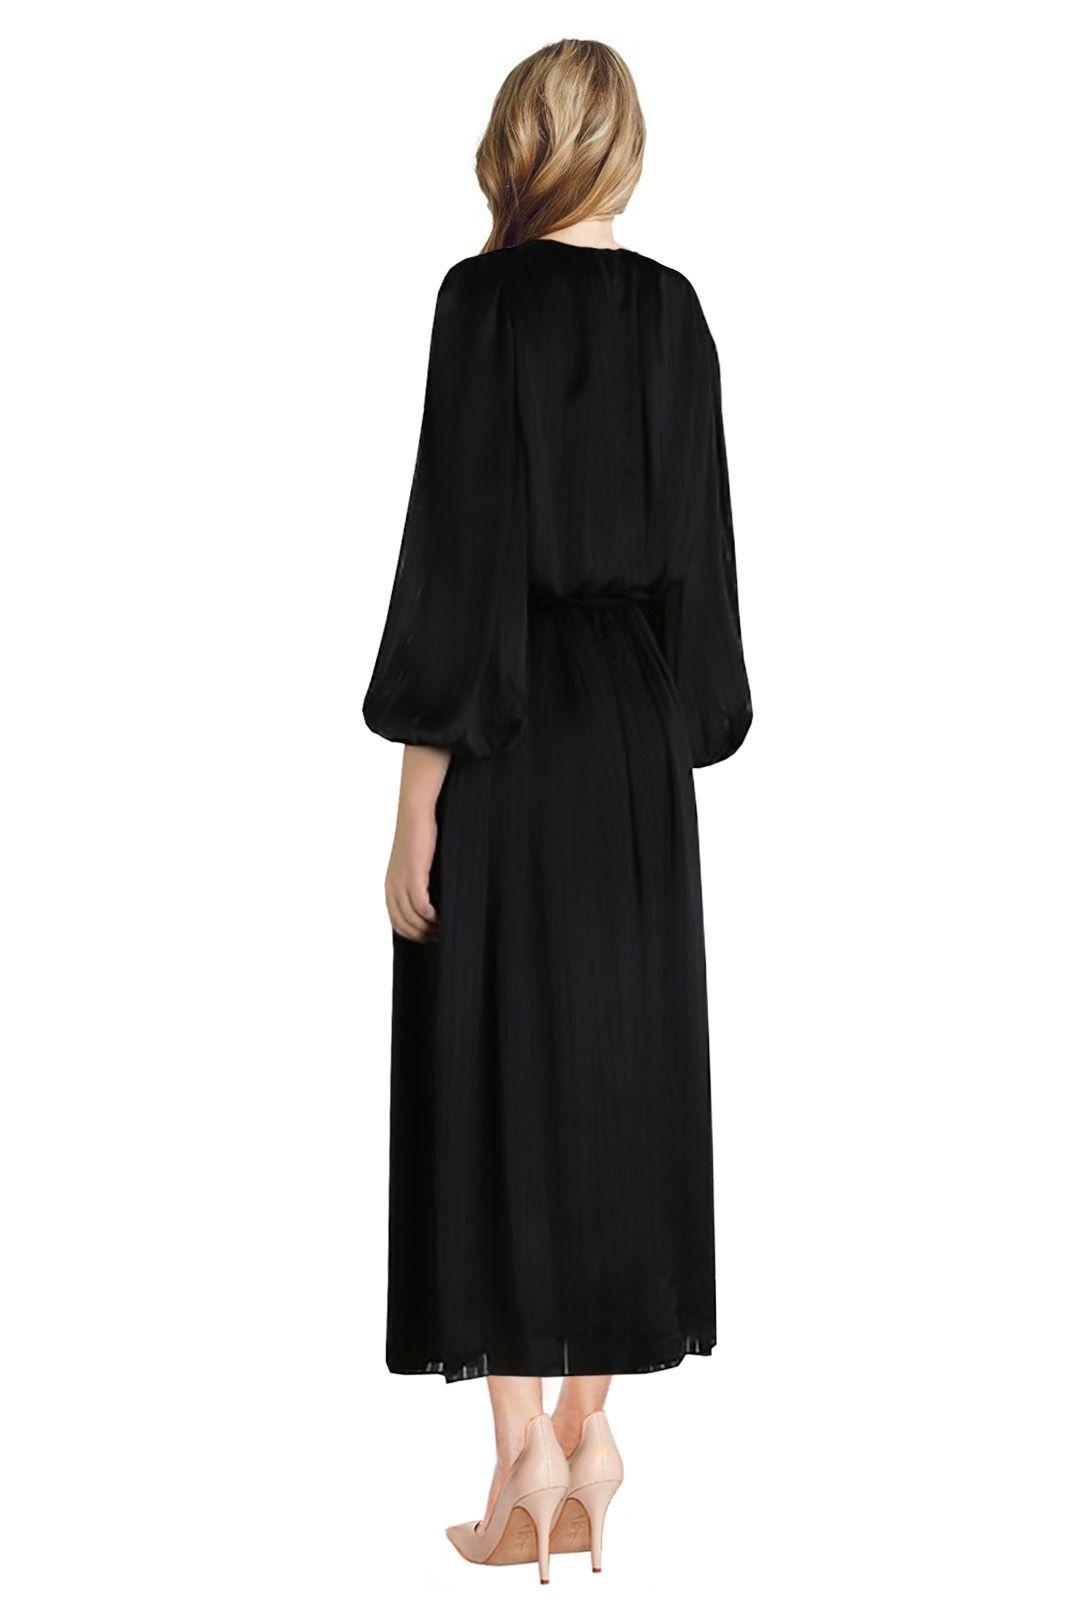 Zimmermann - Arcadia Stripe Slouch Dress - Black - Back